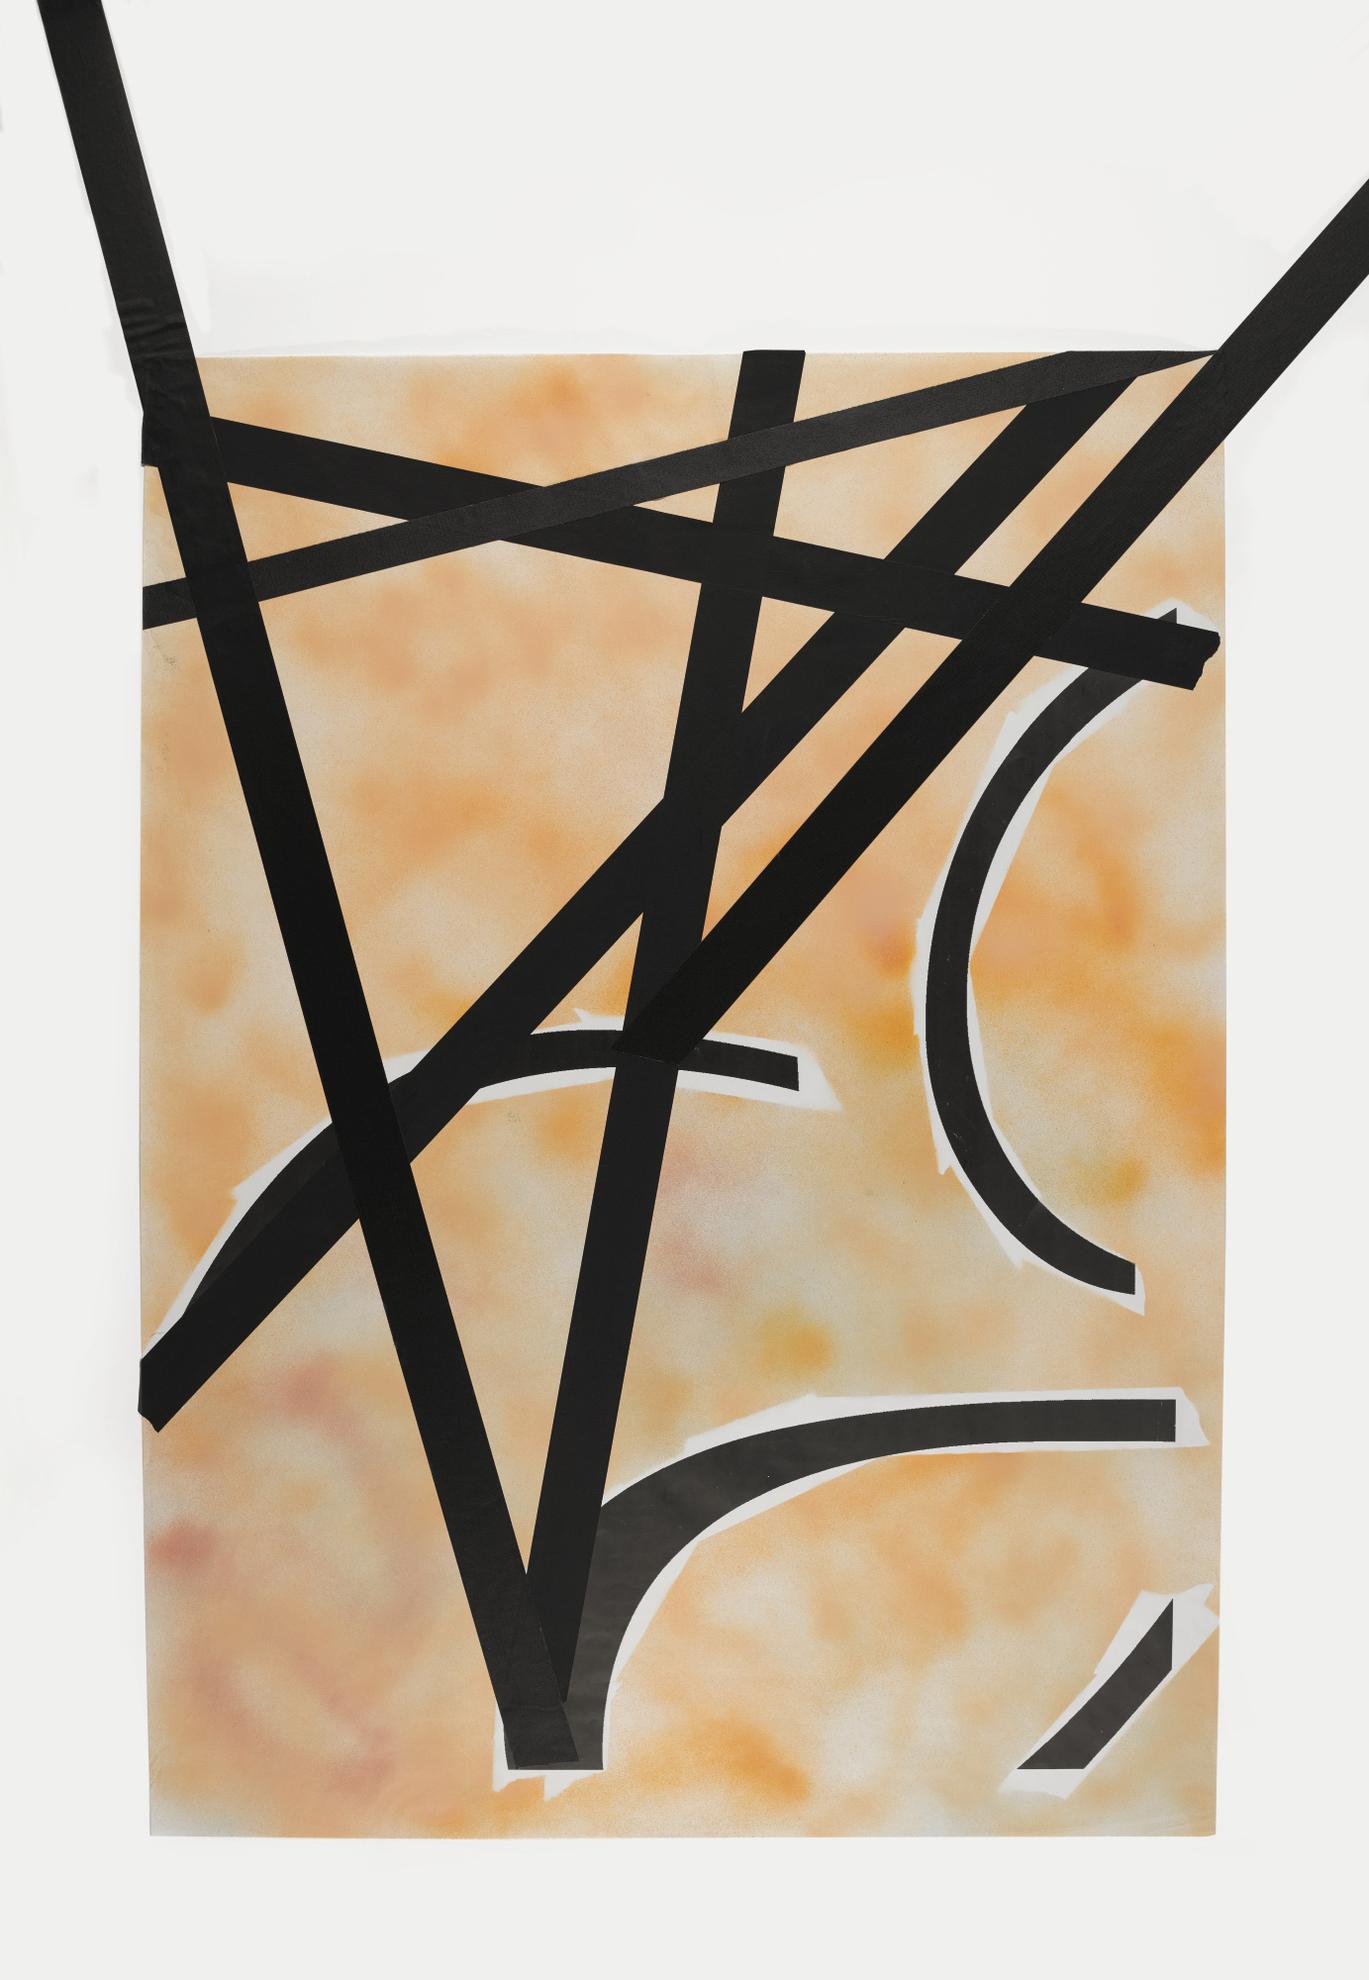 Clement Rodzielski - Untitled (A)-2008